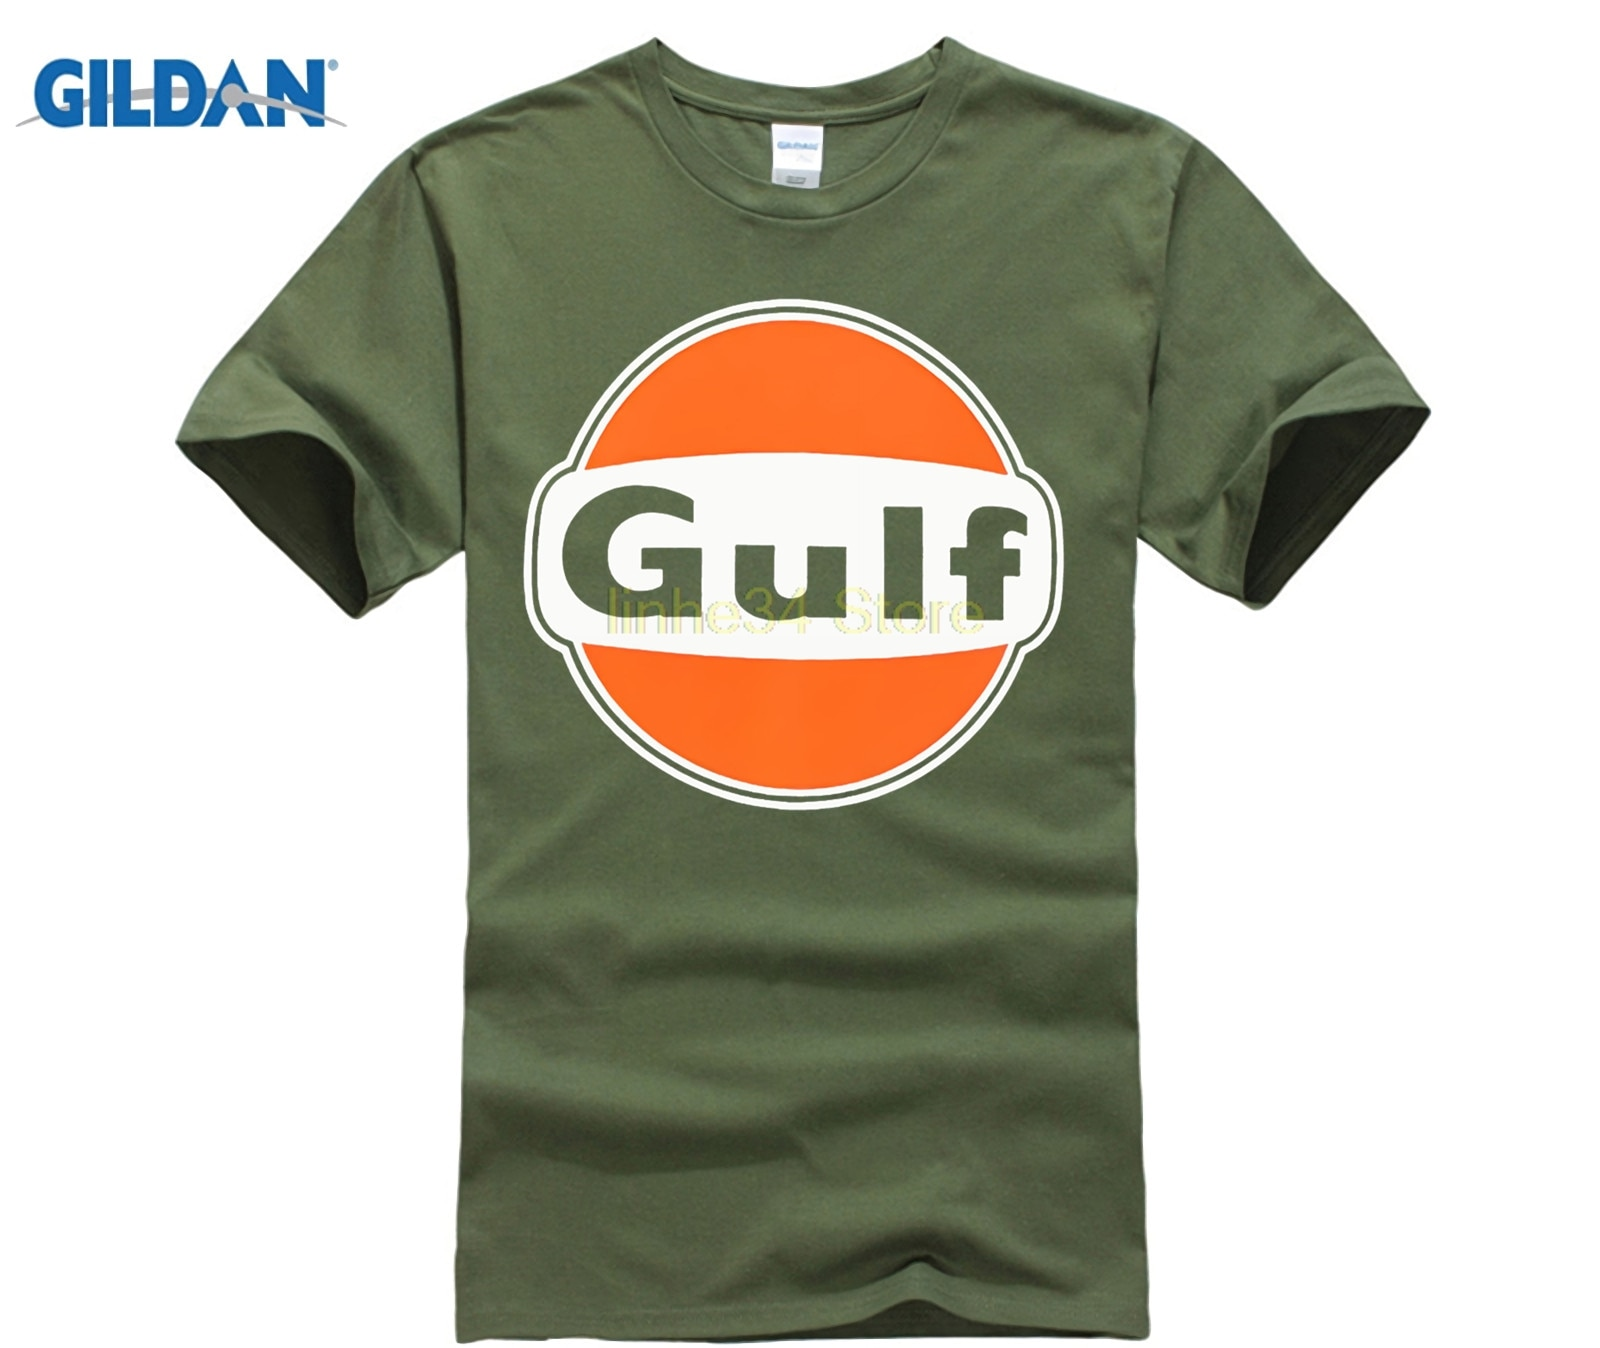 GILDAN, auténtico T-SHIRT-BLUE-LE de aceite del Norte, para hombre, XS, S, M, L, XL-XXL-XXXL, Envío Gratis a Reino Unido